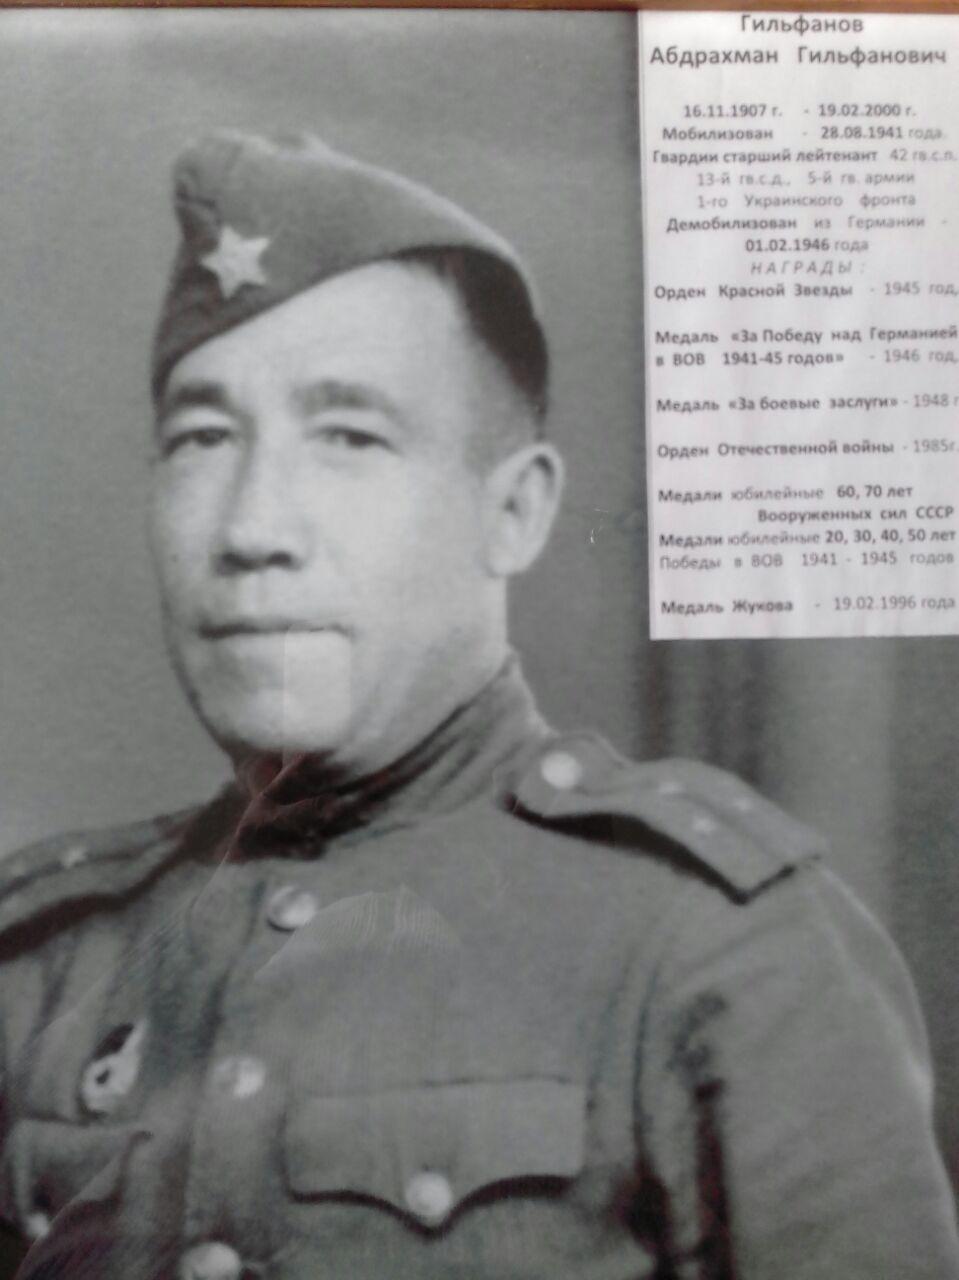 Гильфанов Абдрахман